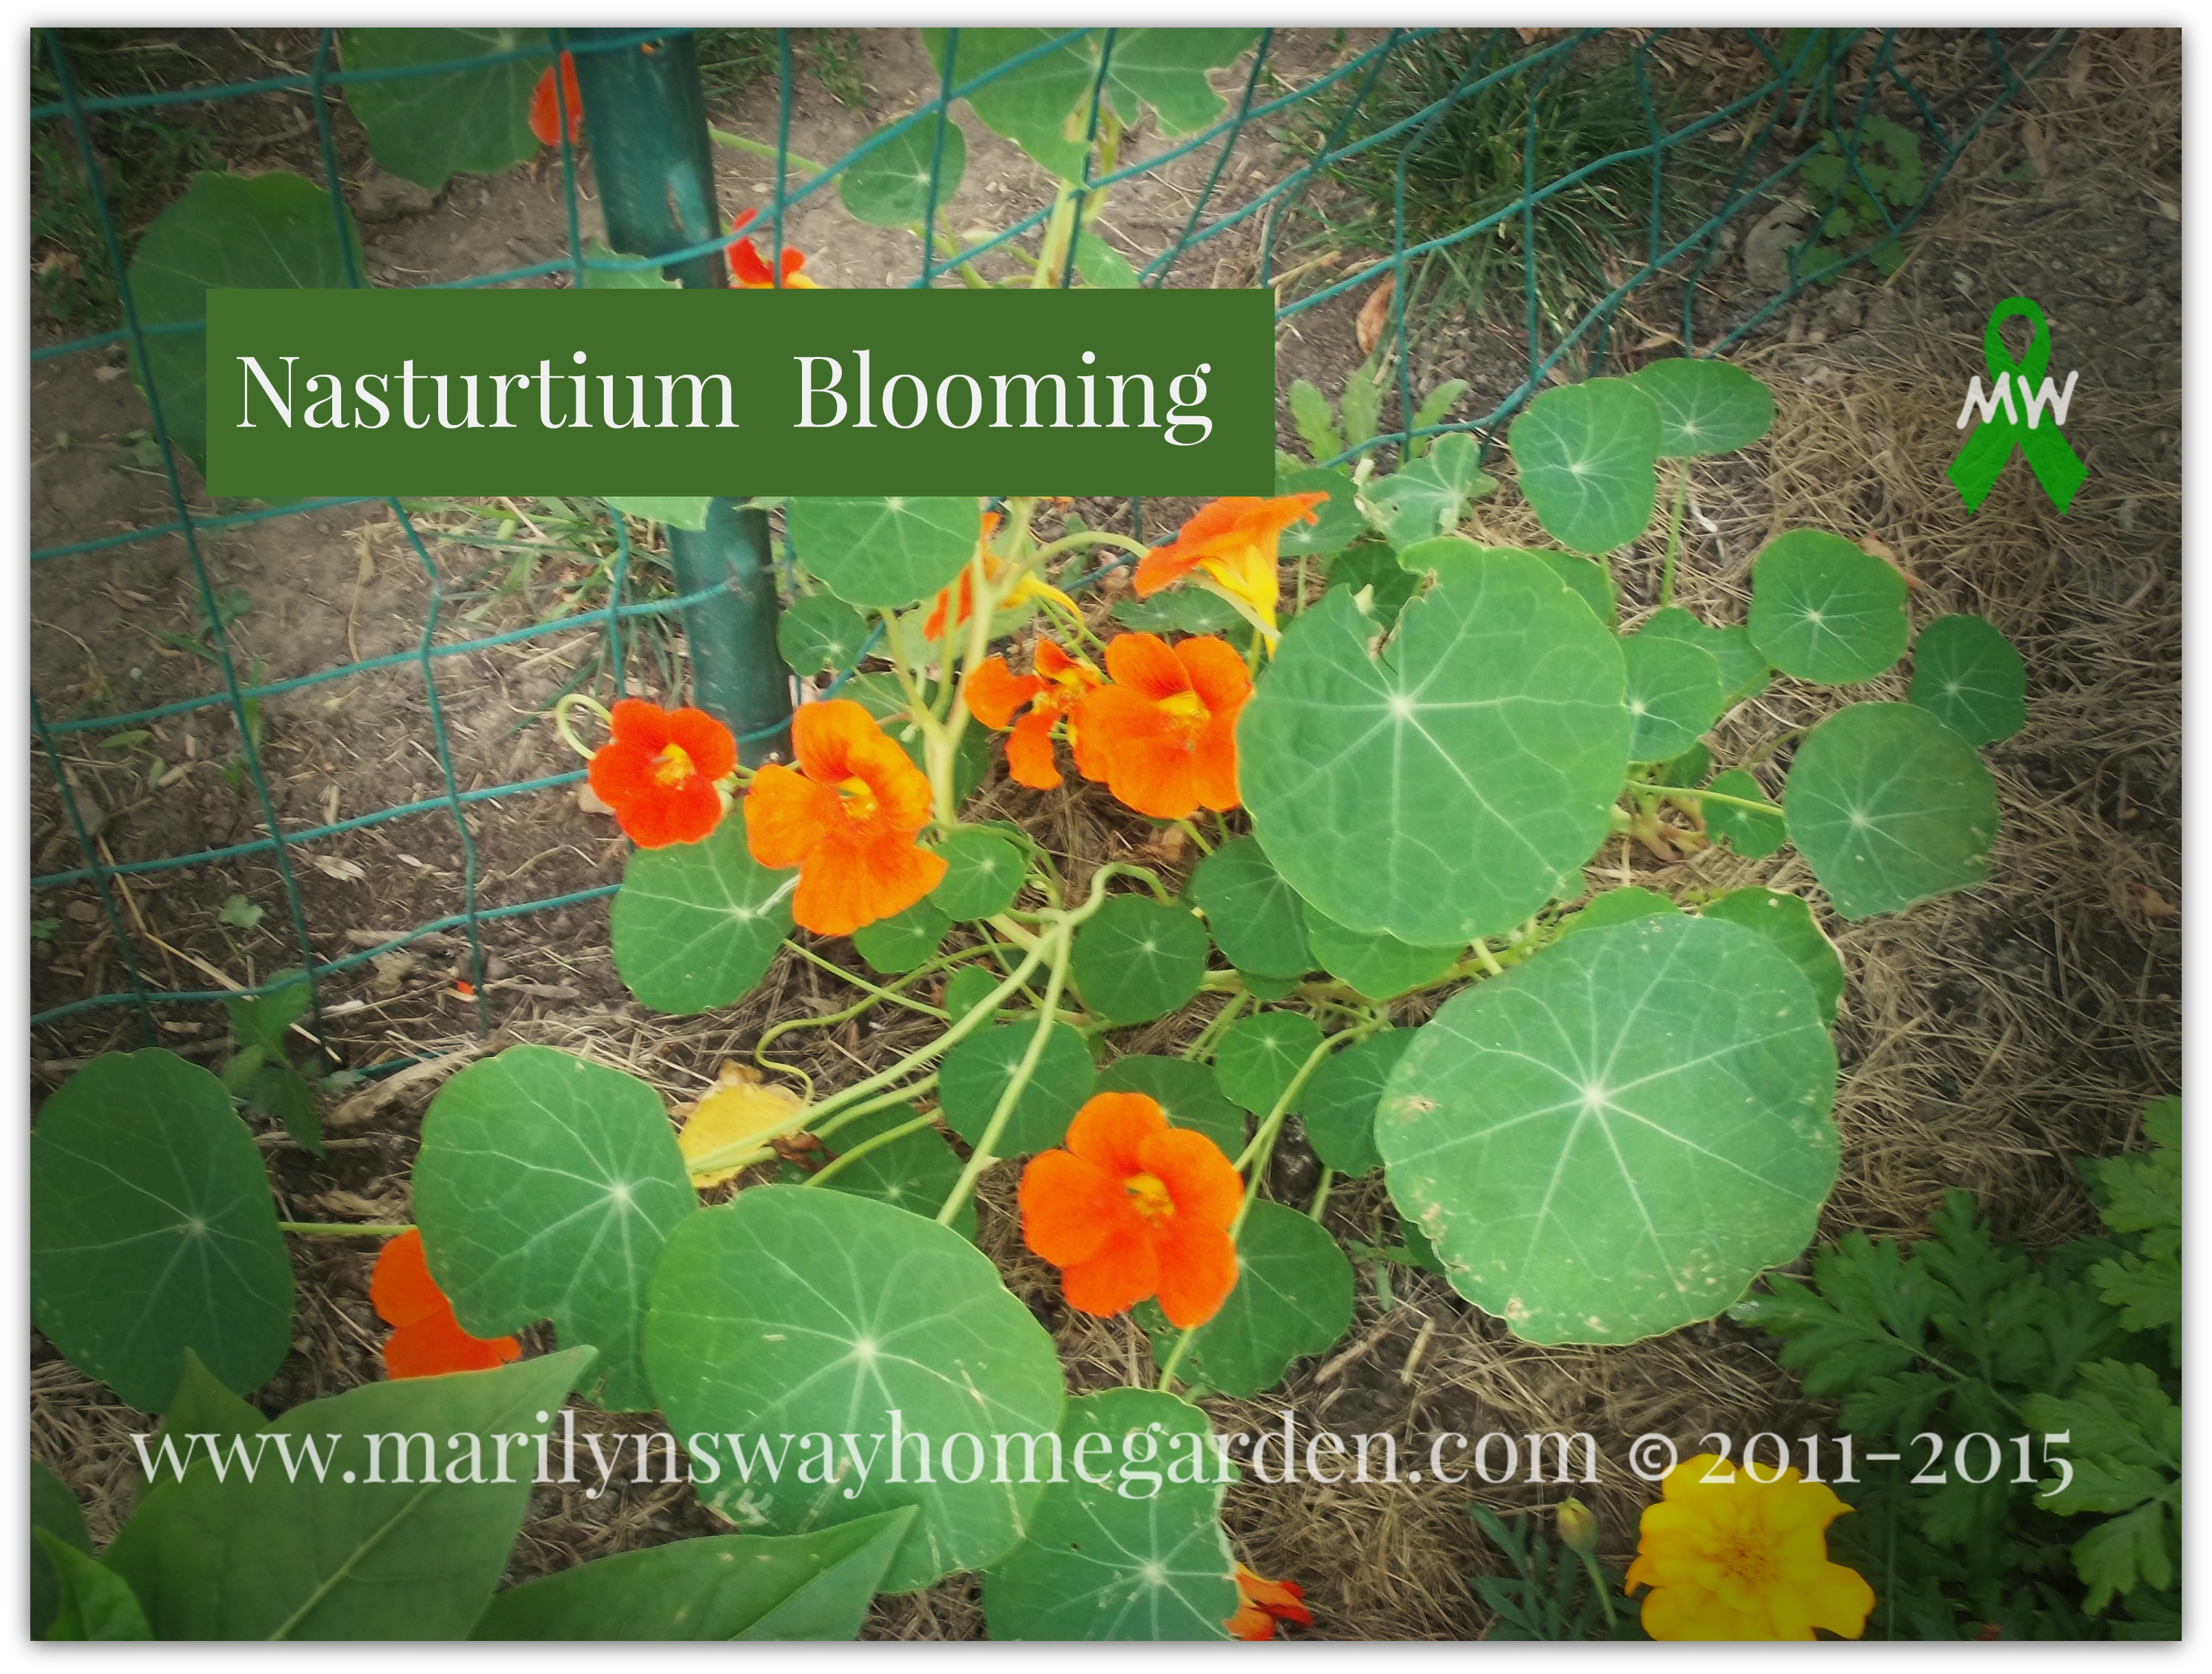 Nasturtium blooming.